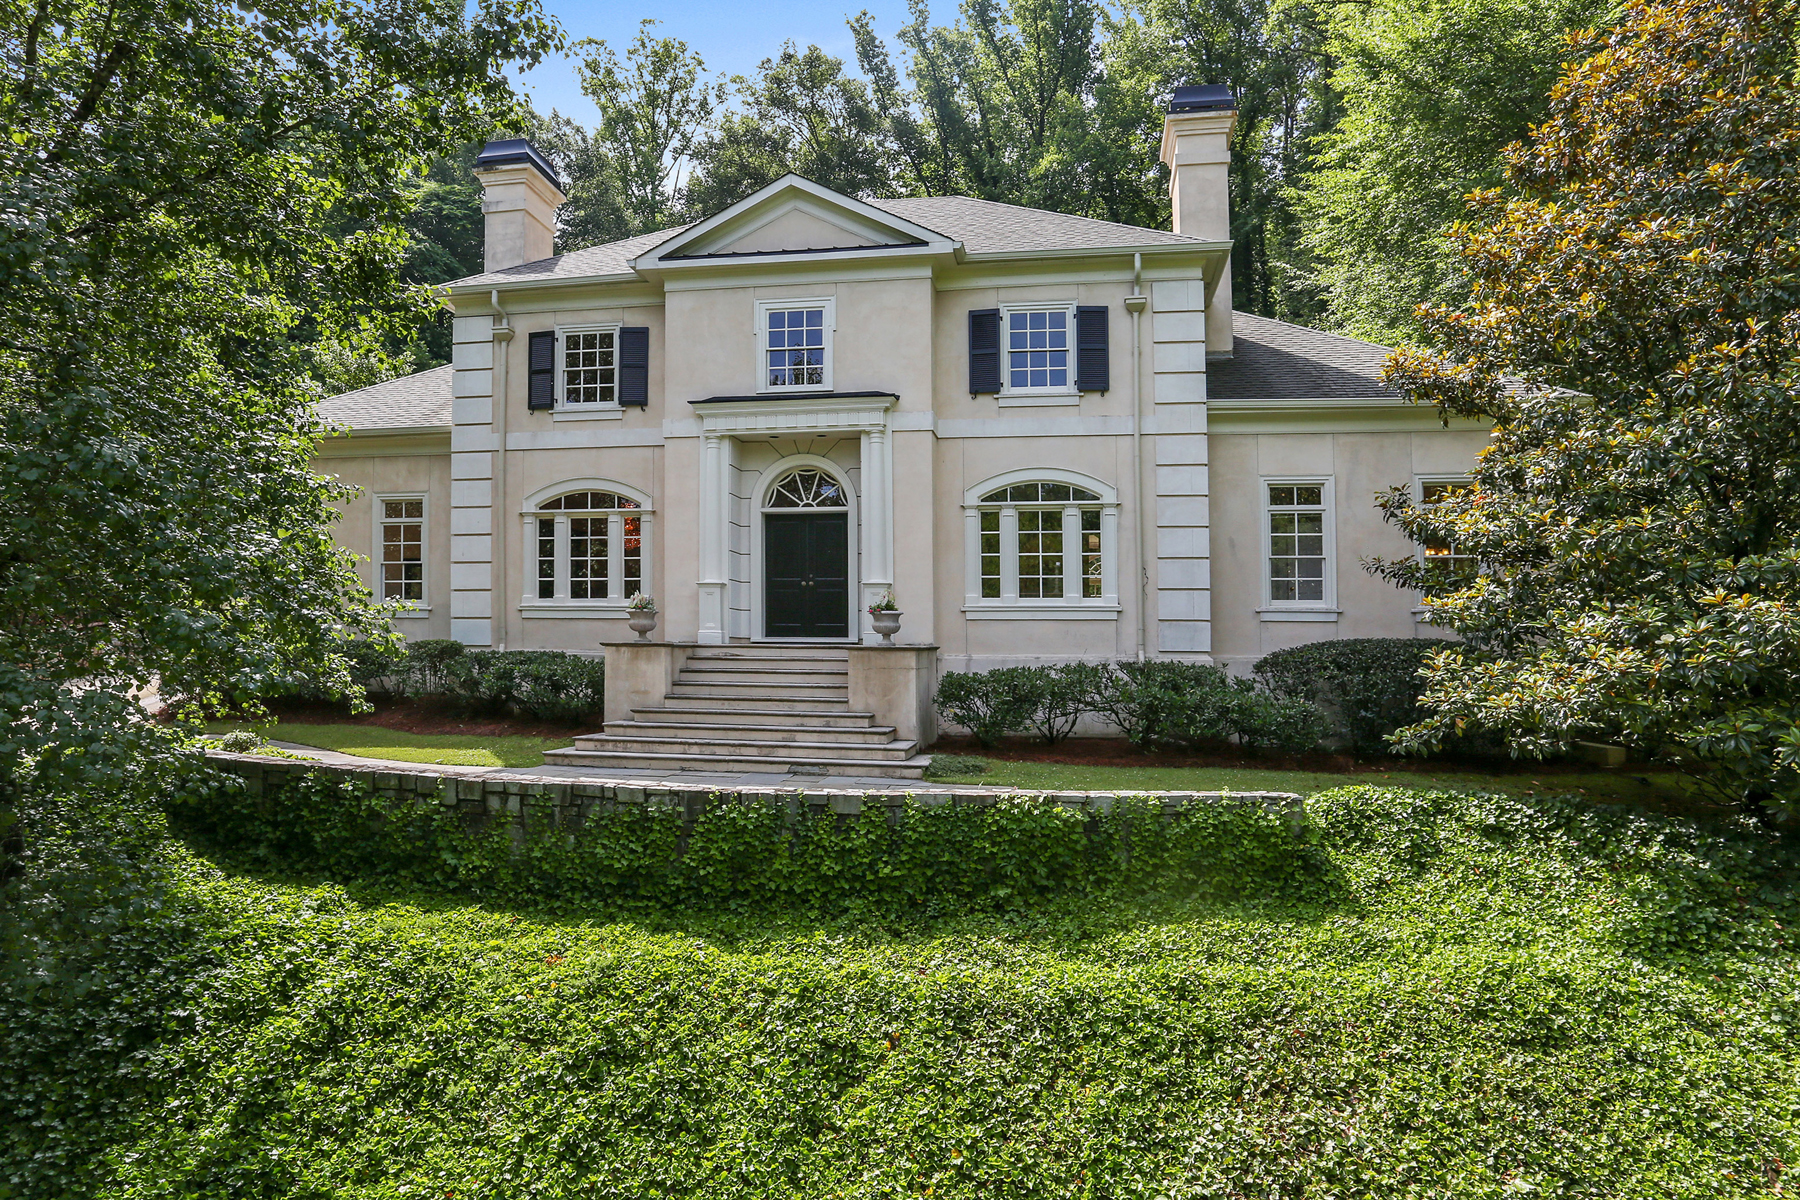 Single Family Home for Sale at Majestic Hilltop Residence 25 Asheworth Court Buckhead, Atlanta, Georgia 30327 United States